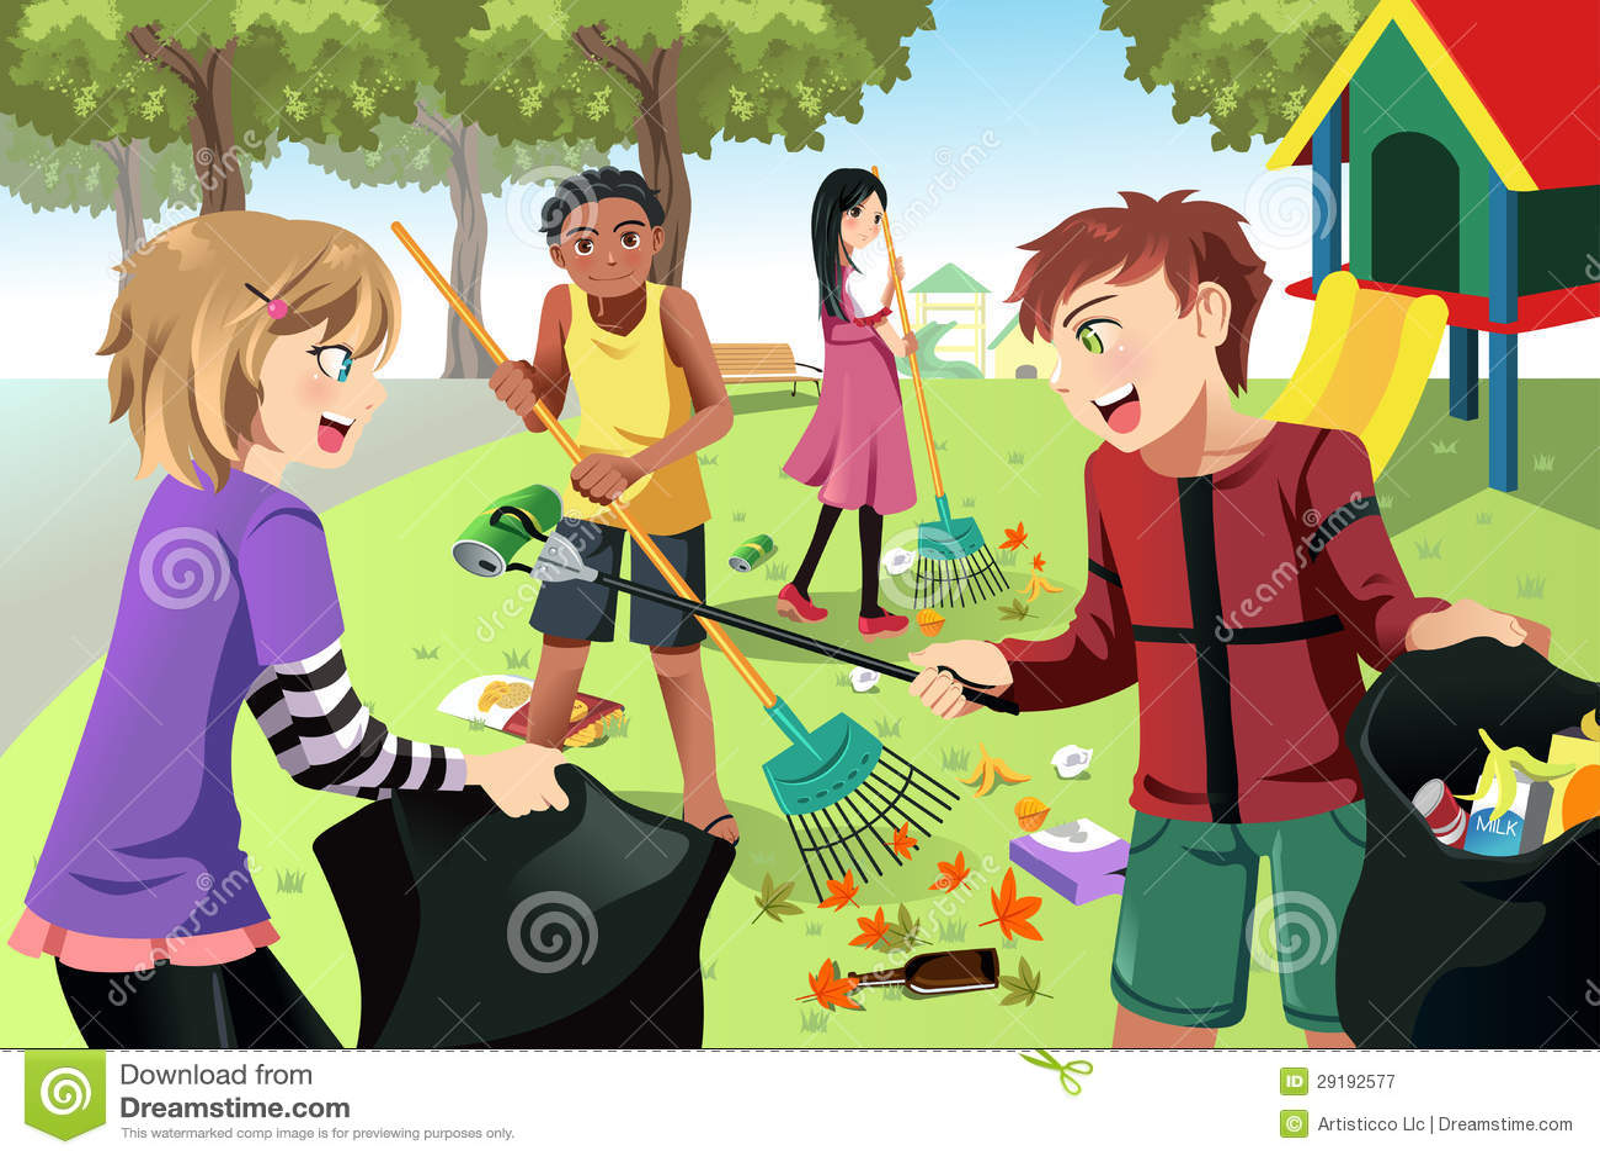 Volunteer Kids Royalty Free Stock Photography